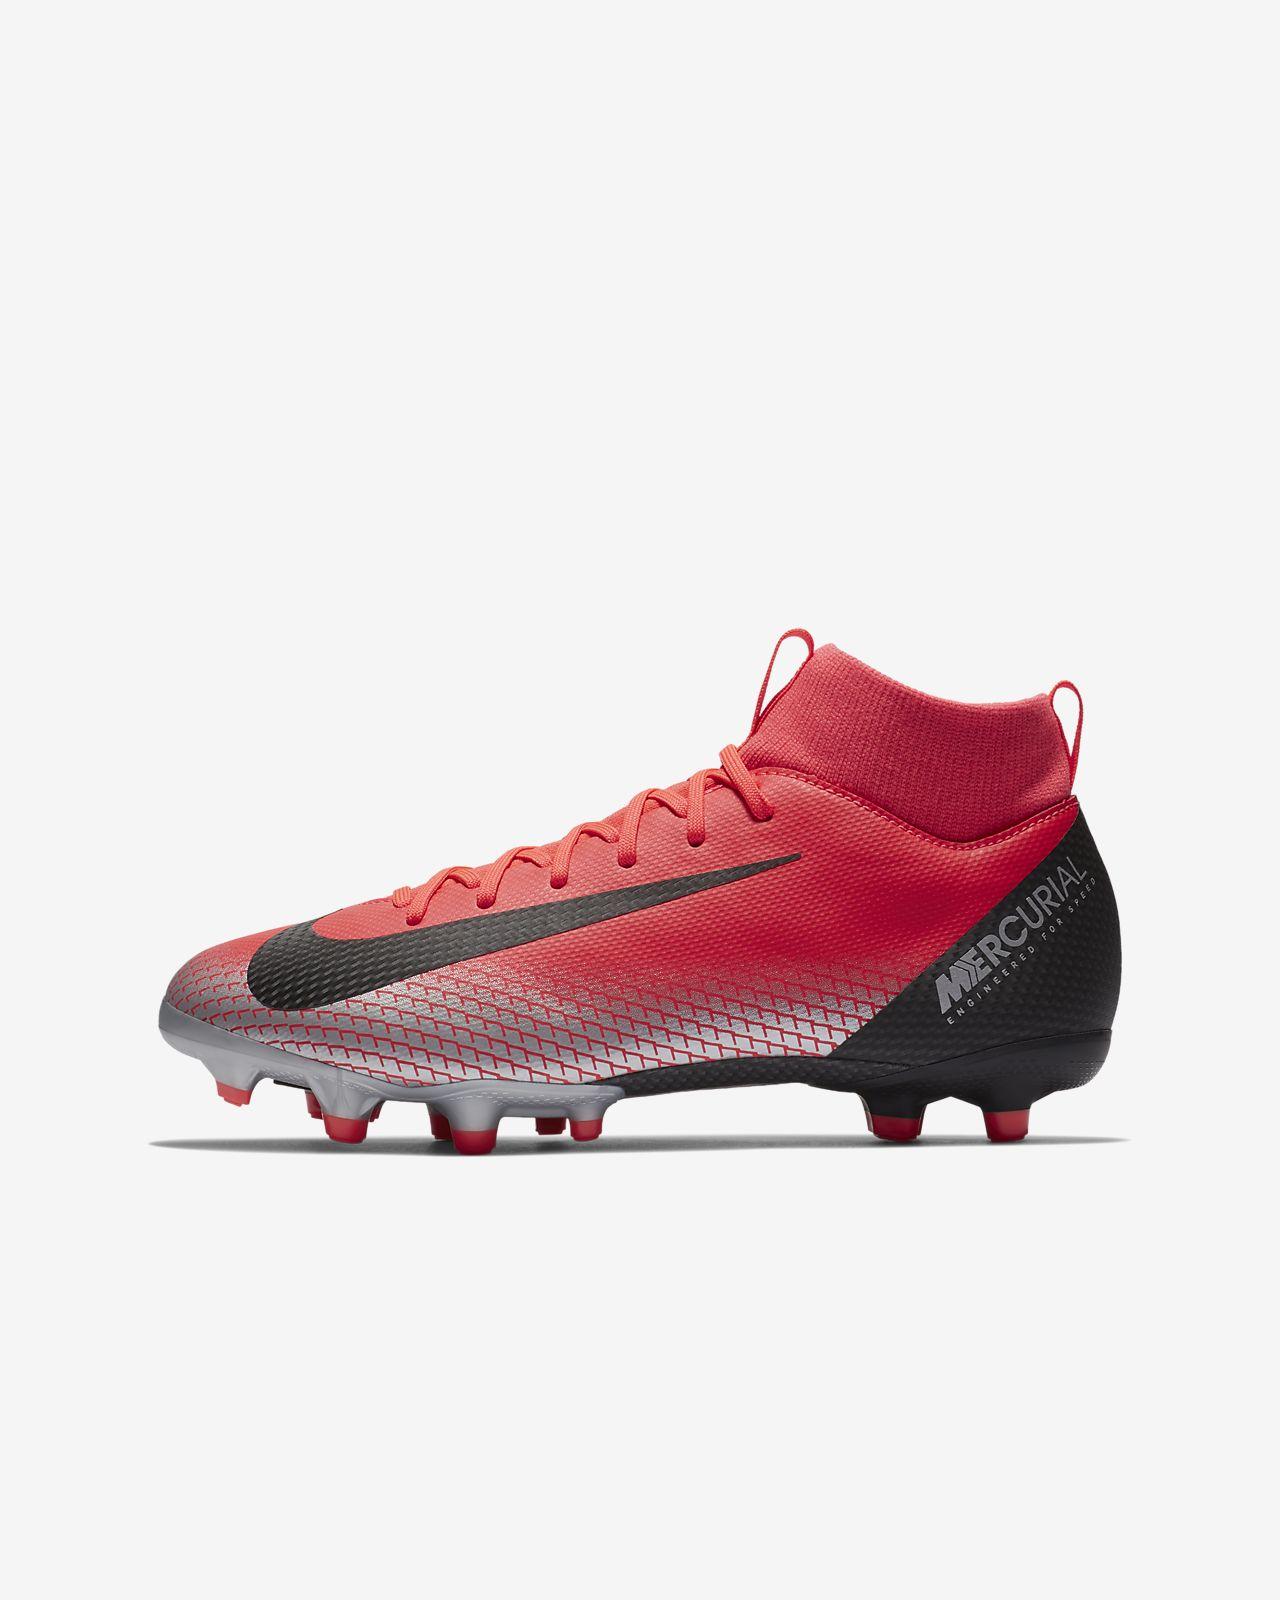 ... Scarpa da calcio multiterreno Nike Jr. Superfly 6 Academy MG - Bambini  Ragazzi 27d866ddead